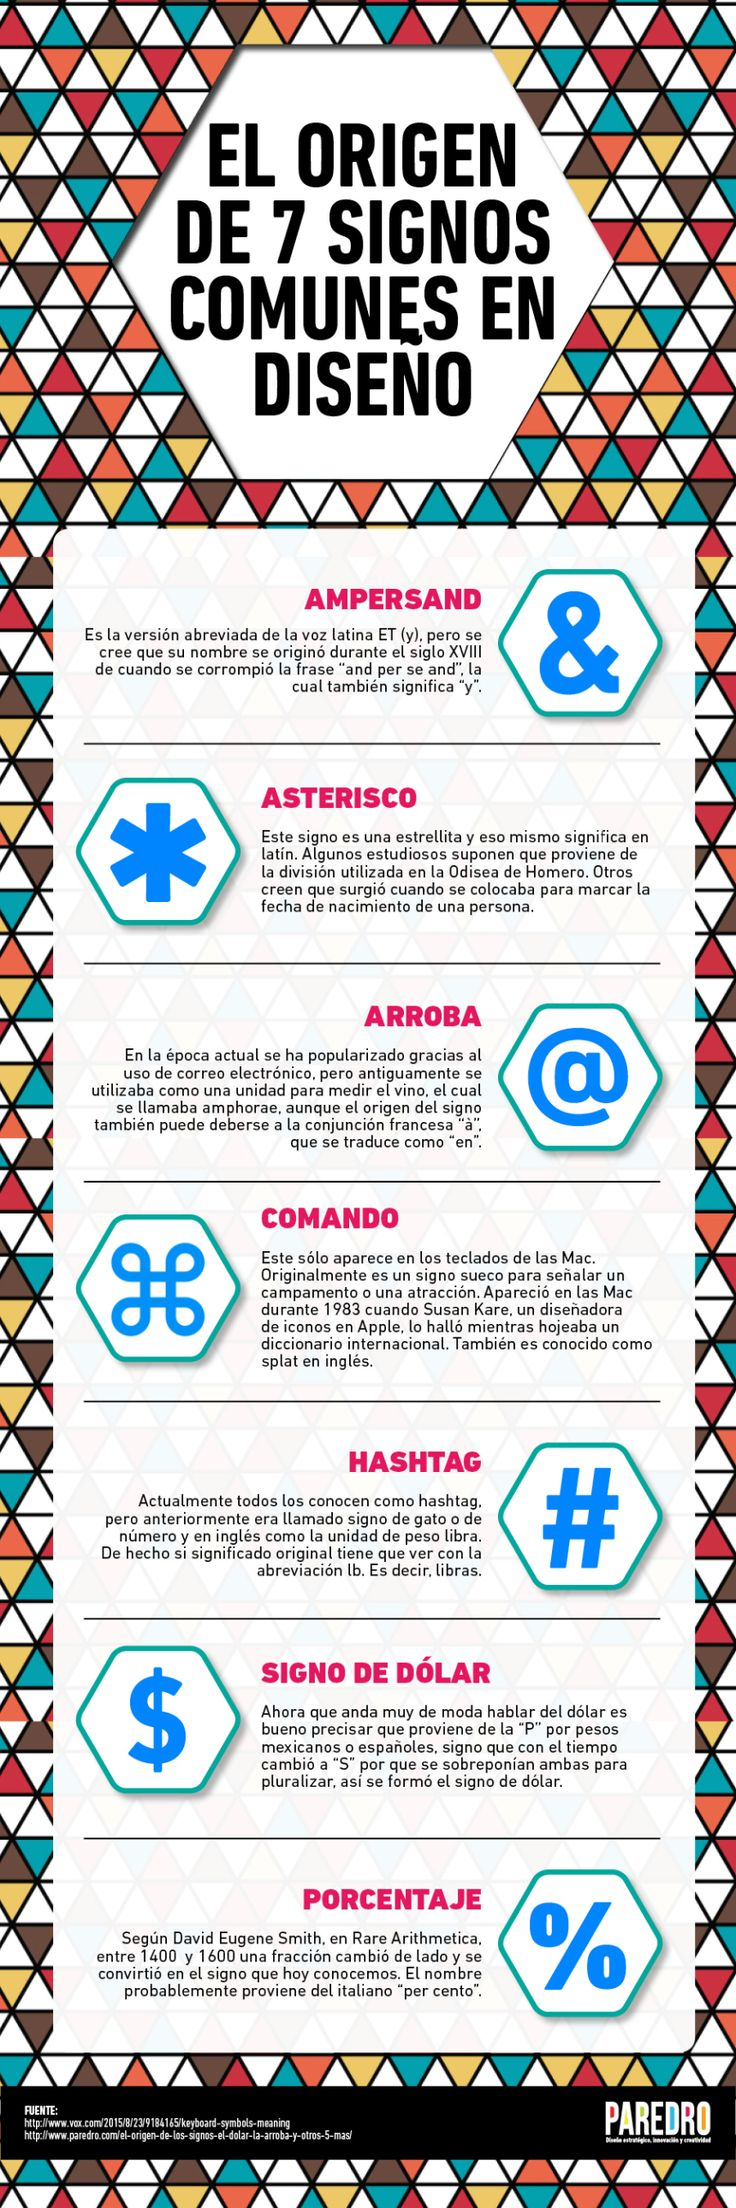 Origen de 7 signos comunes en Diseño #infografia # ...